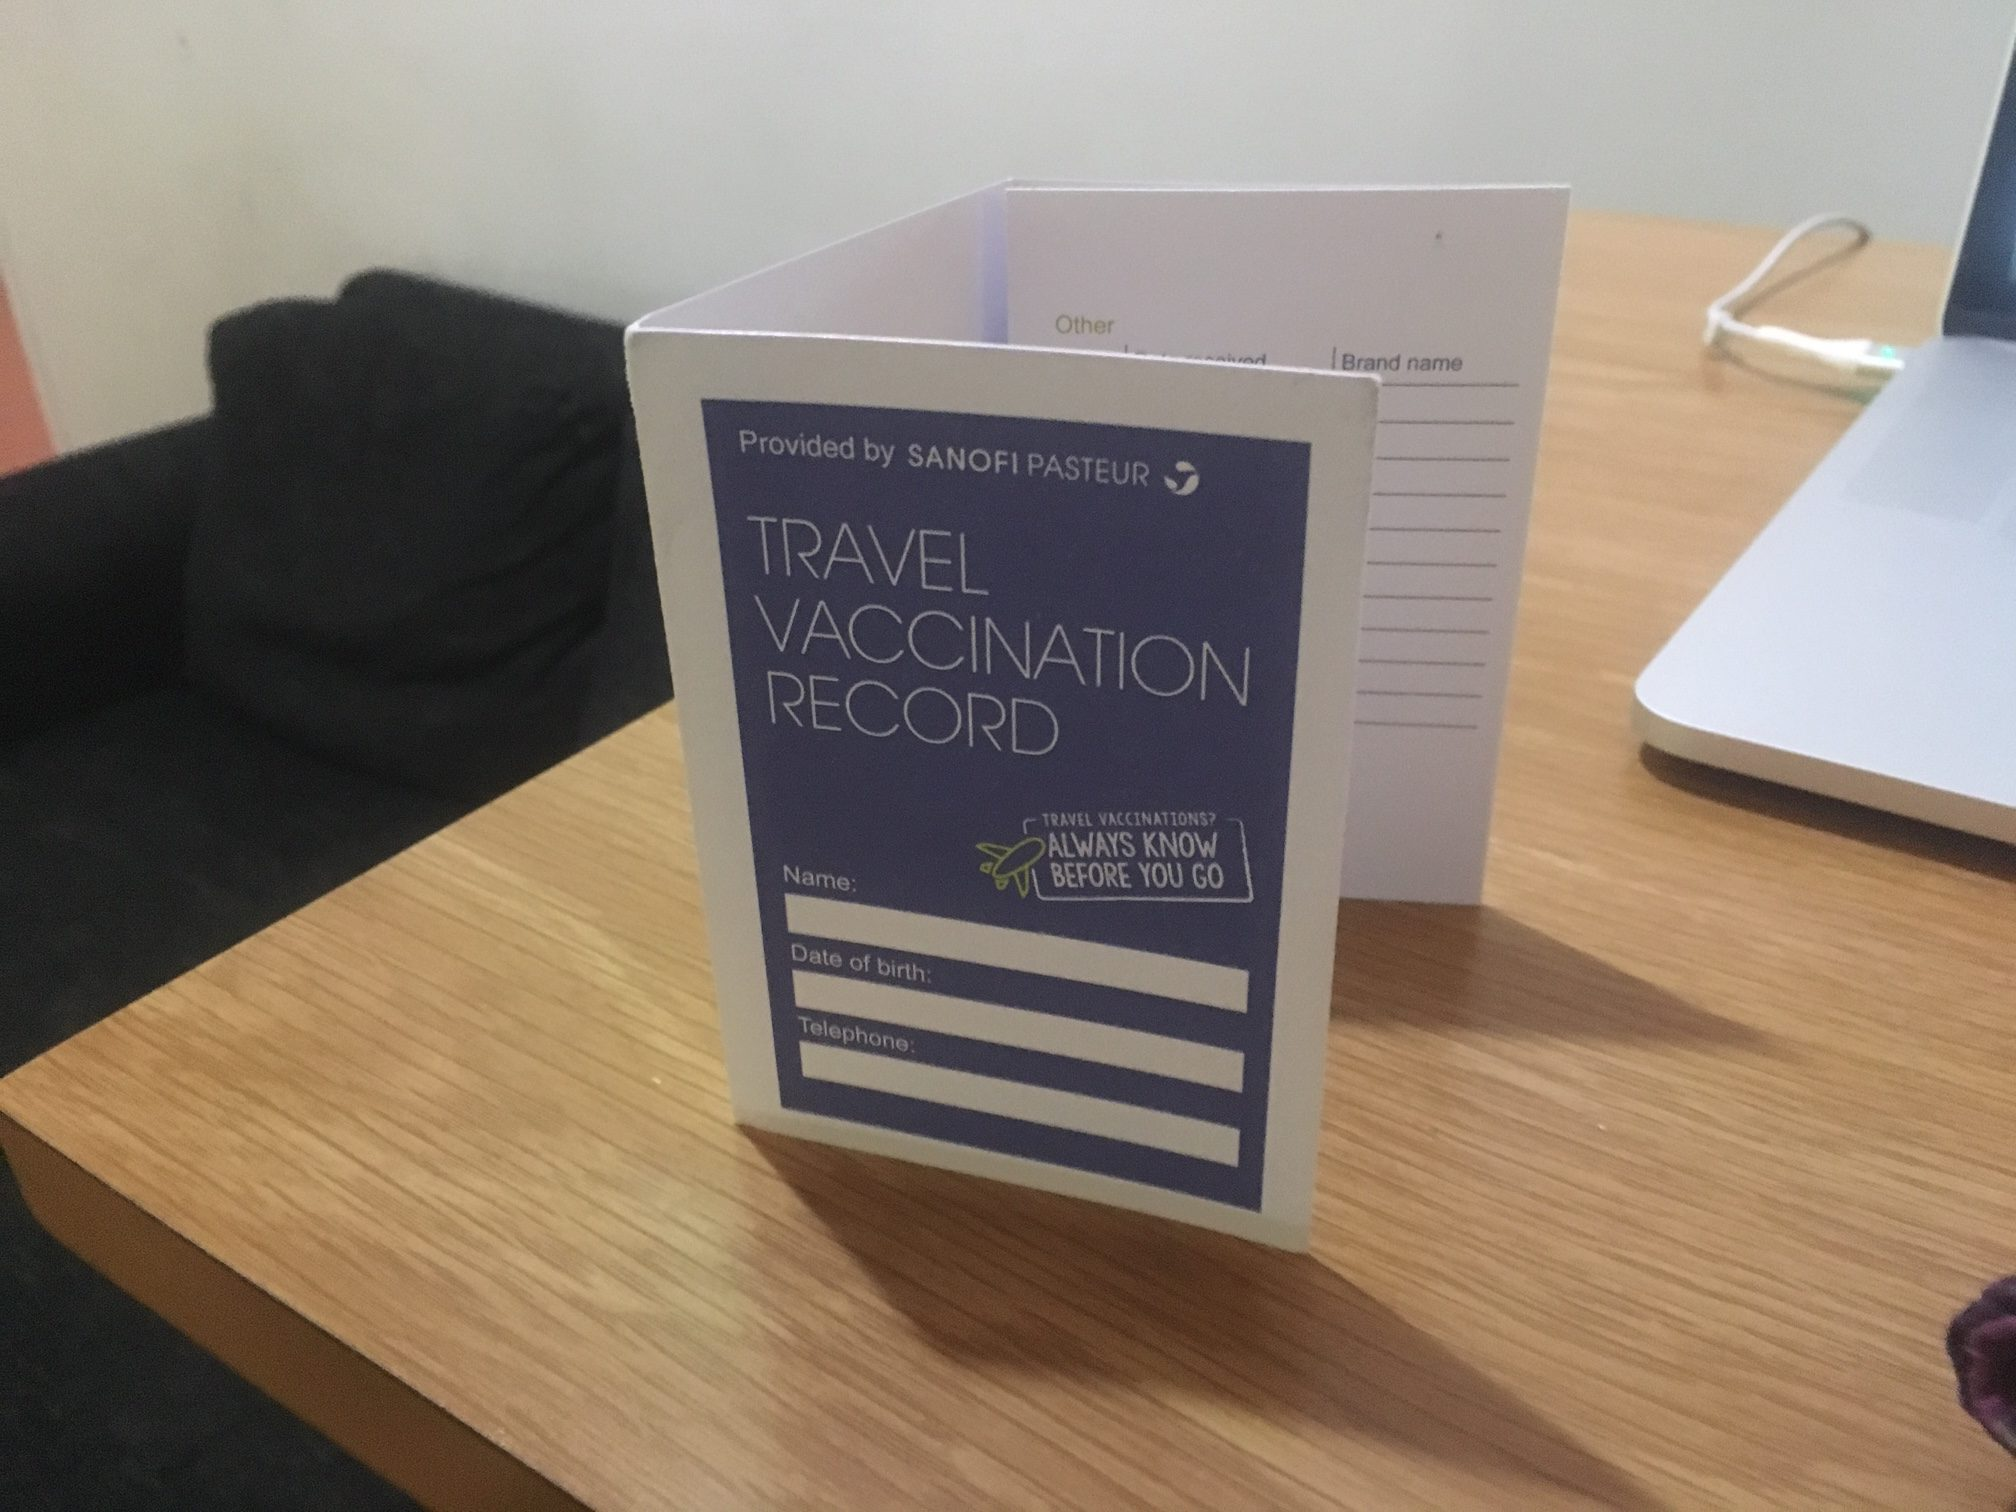 Travel vaccine card